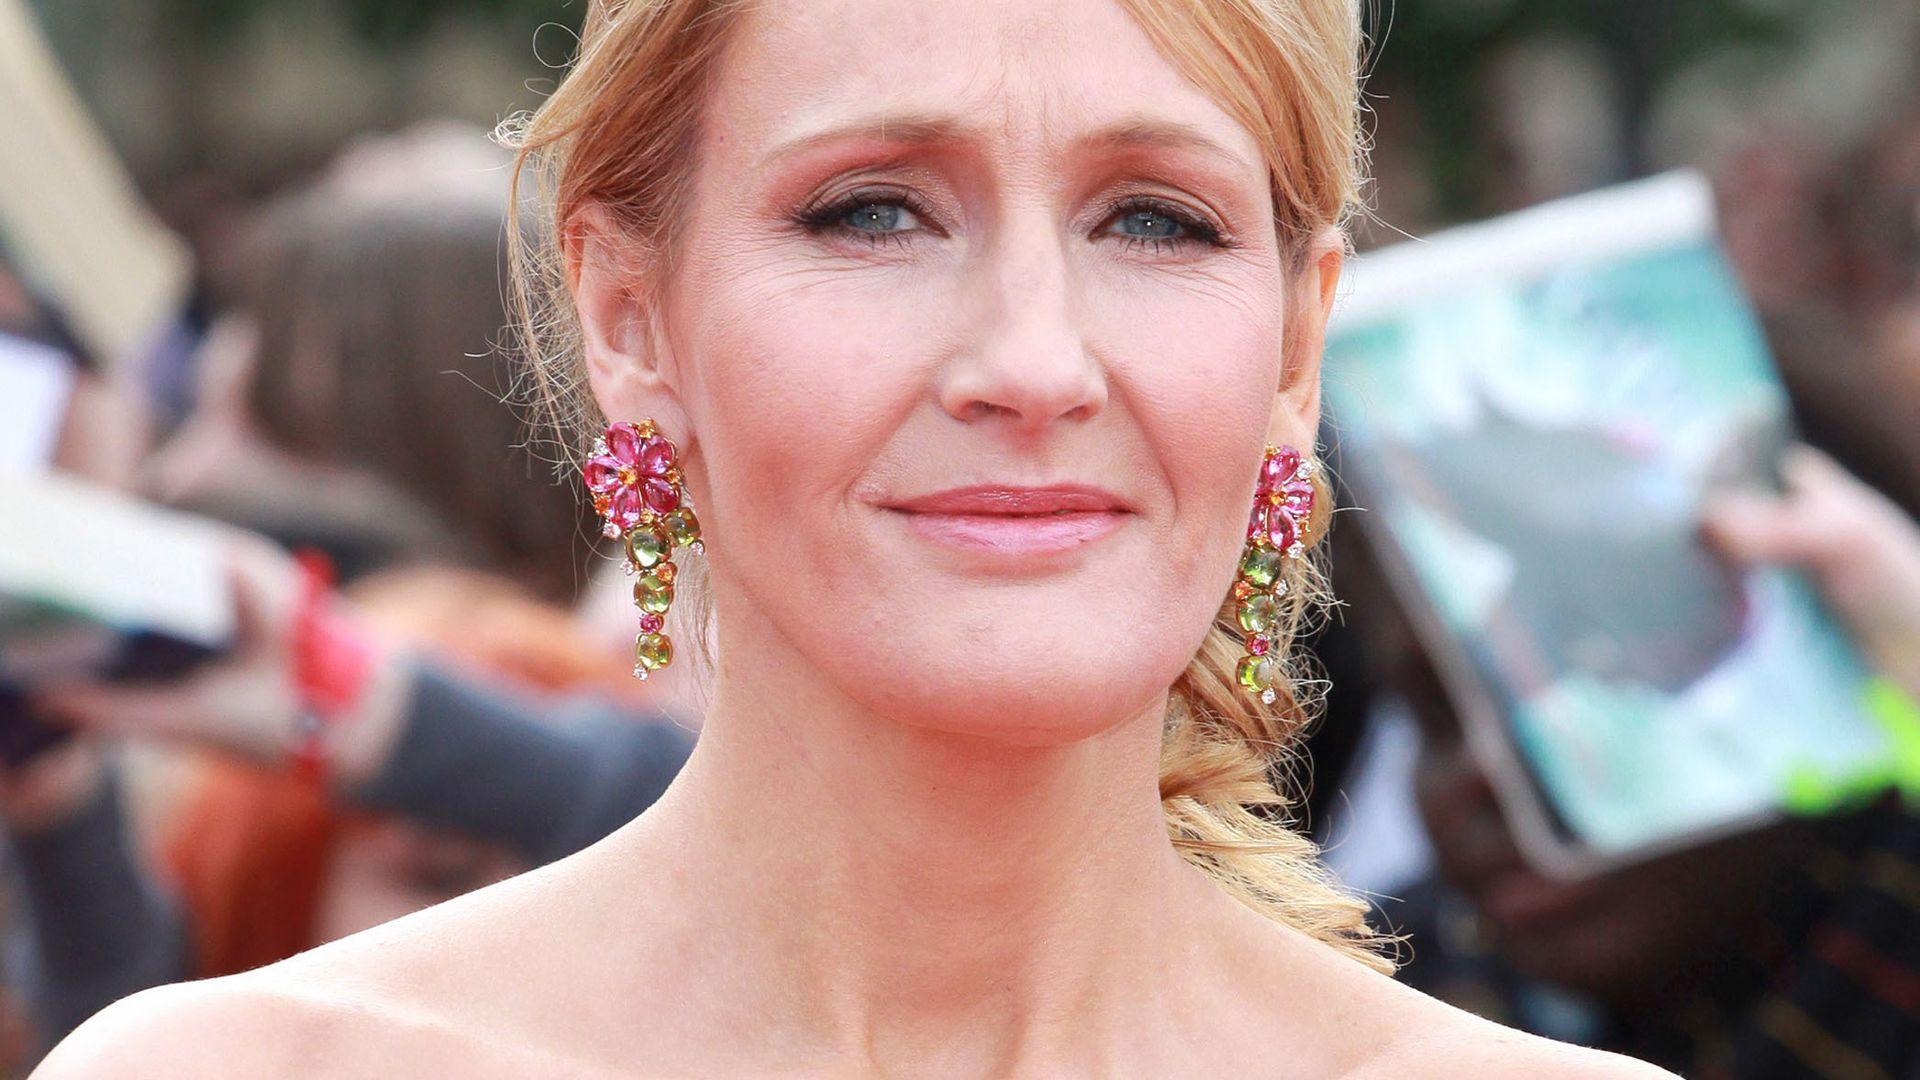 Streit um Zaubererliebe: Dumbledore schwul: Rowling